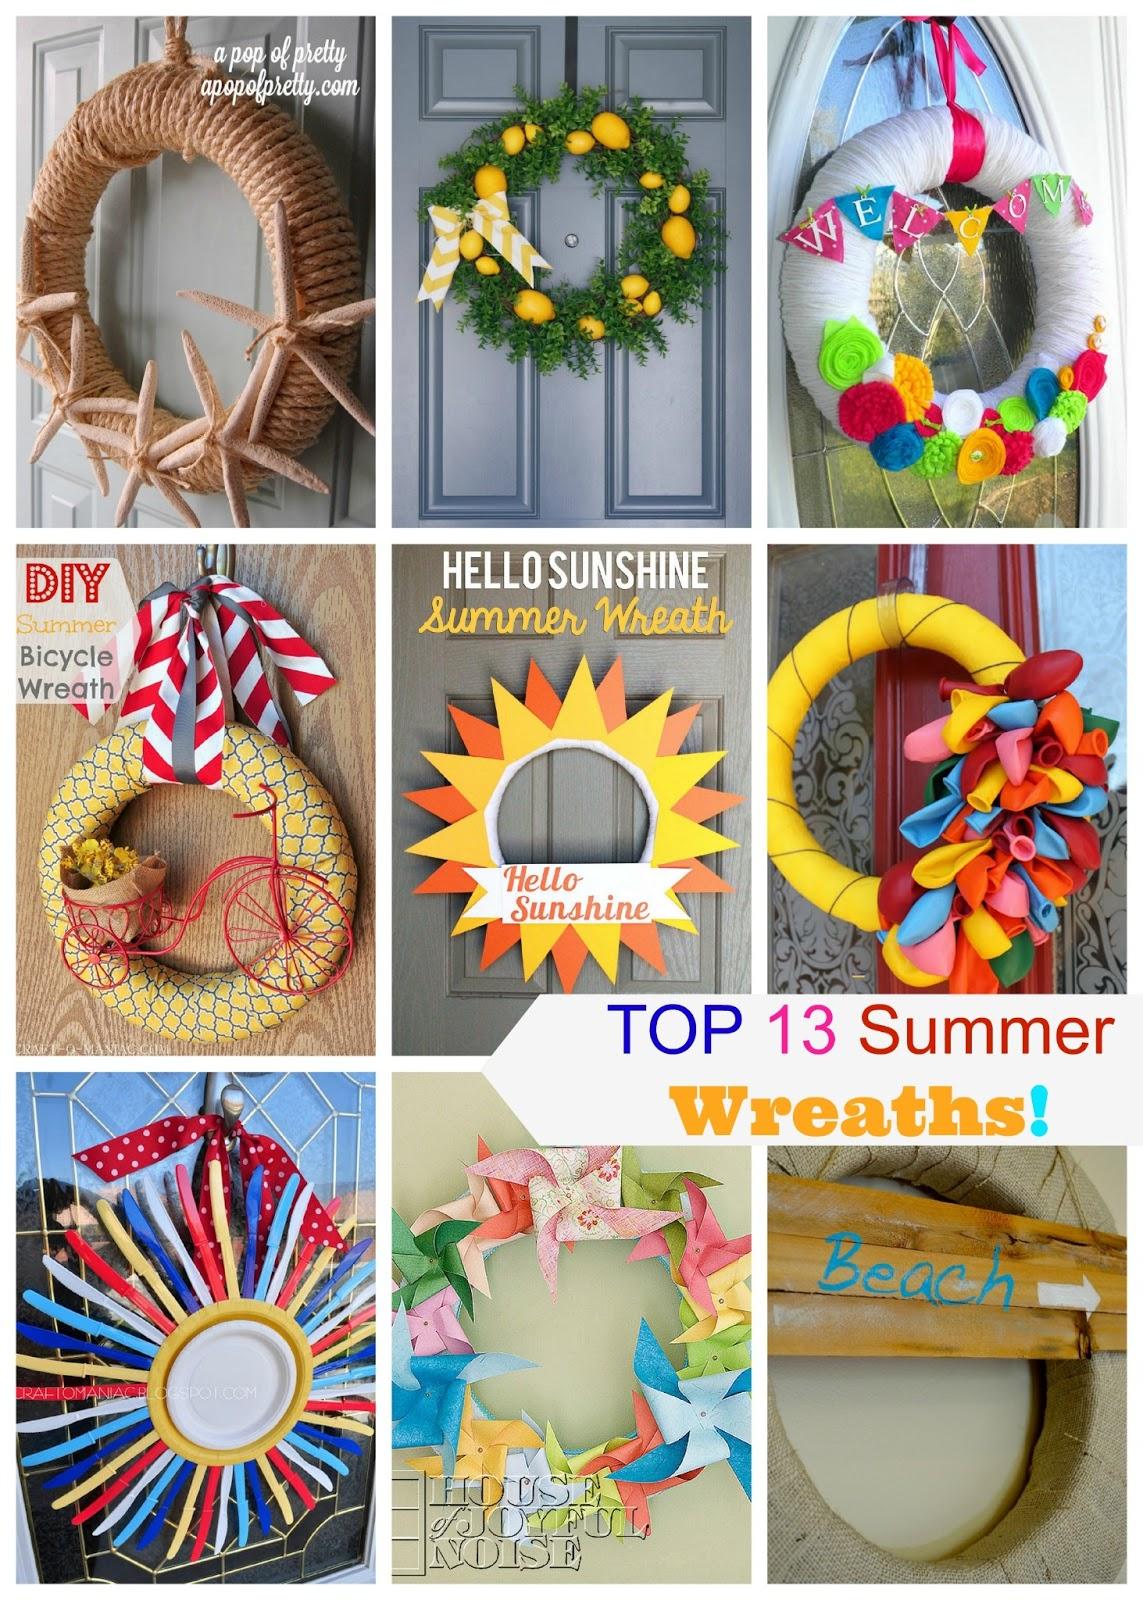 Top 13 summer wreaths for Diy summer wreath